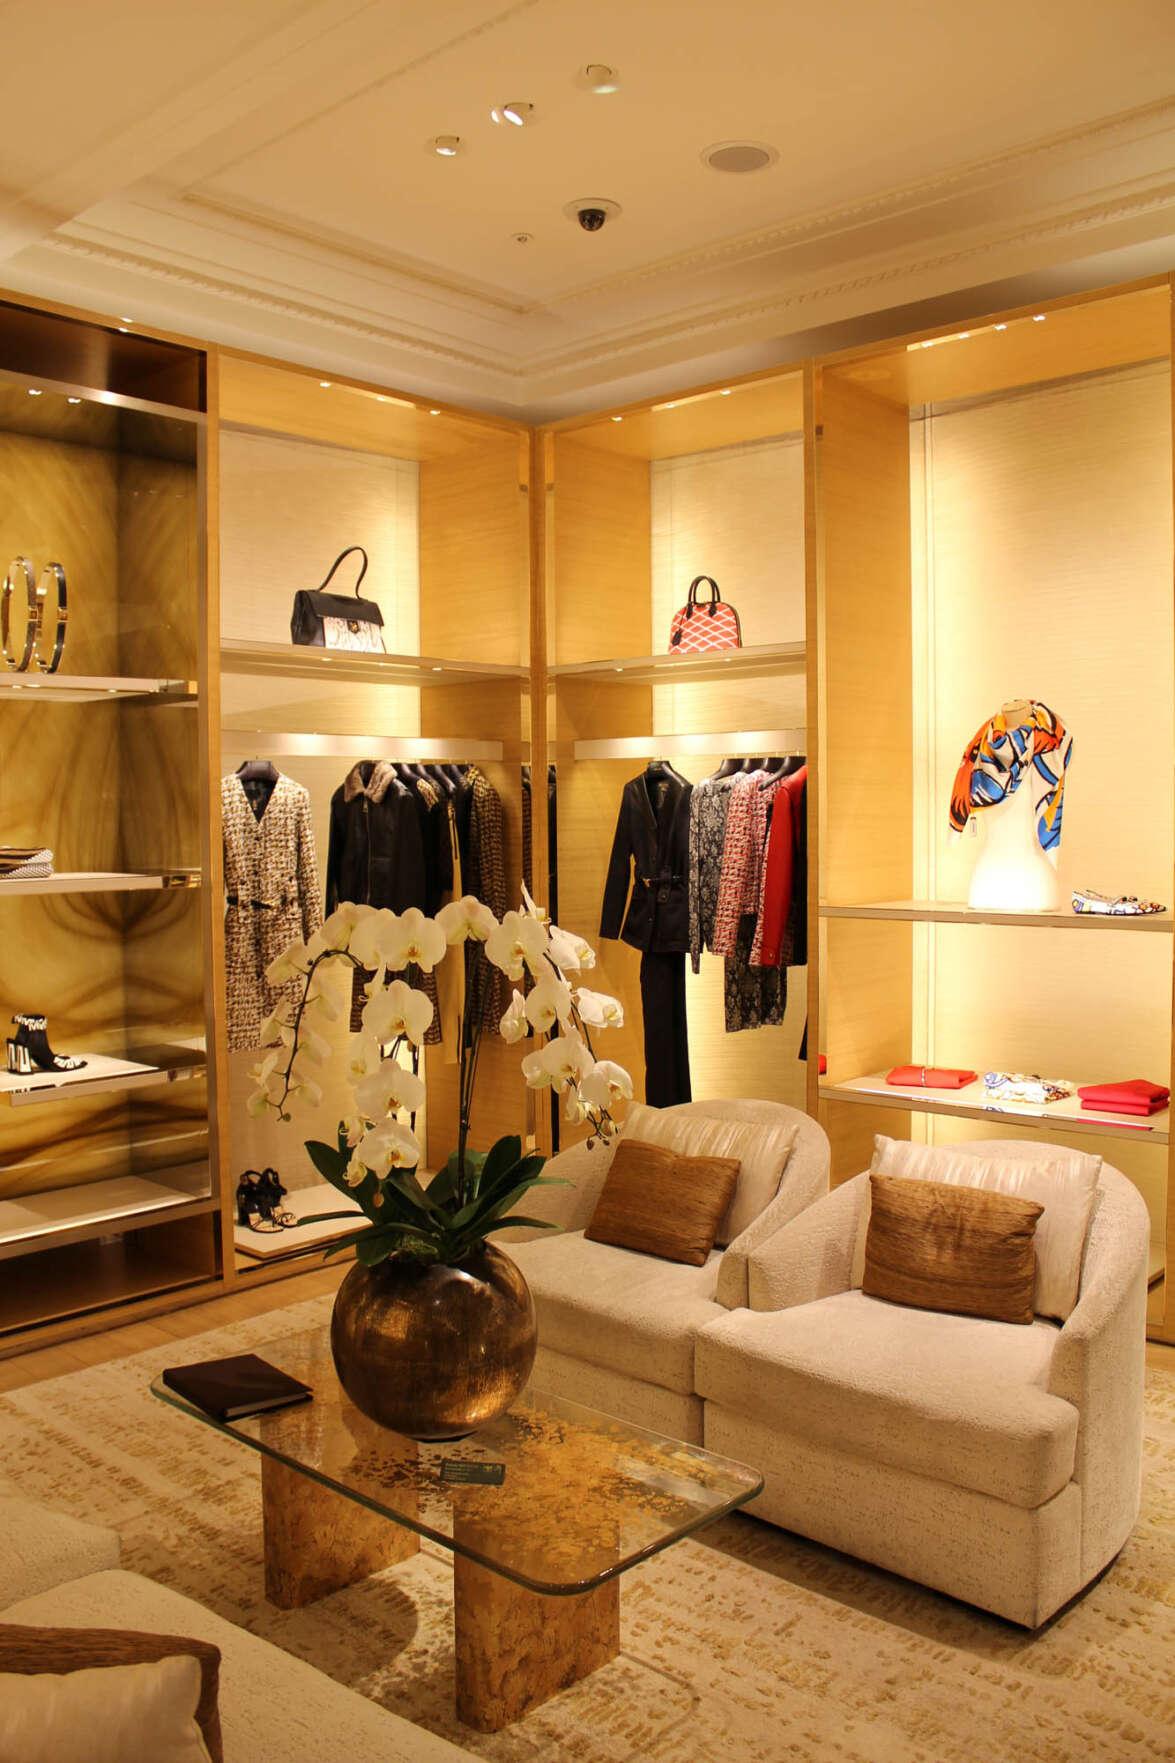 Louis Vuitton Stores